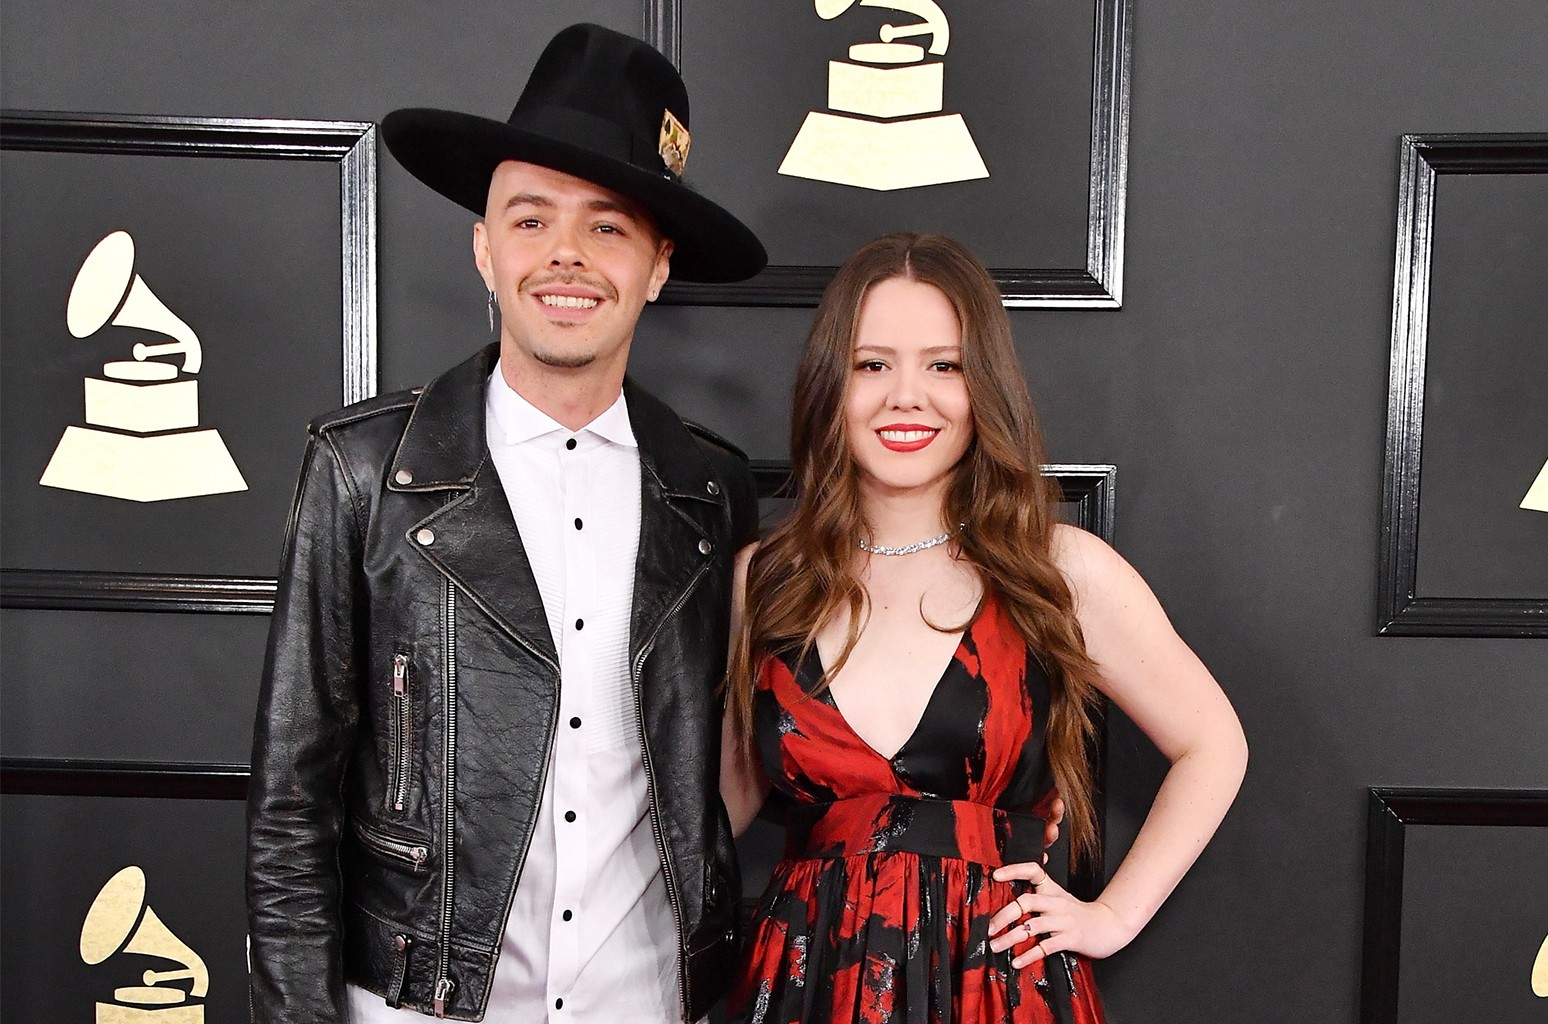 Jesse Huerta (L) and Joy Huerta of Jesse & Joy attend The 59th Grammy Awards at Staples Center on Feb. 12, 2017 in Los Angeles.